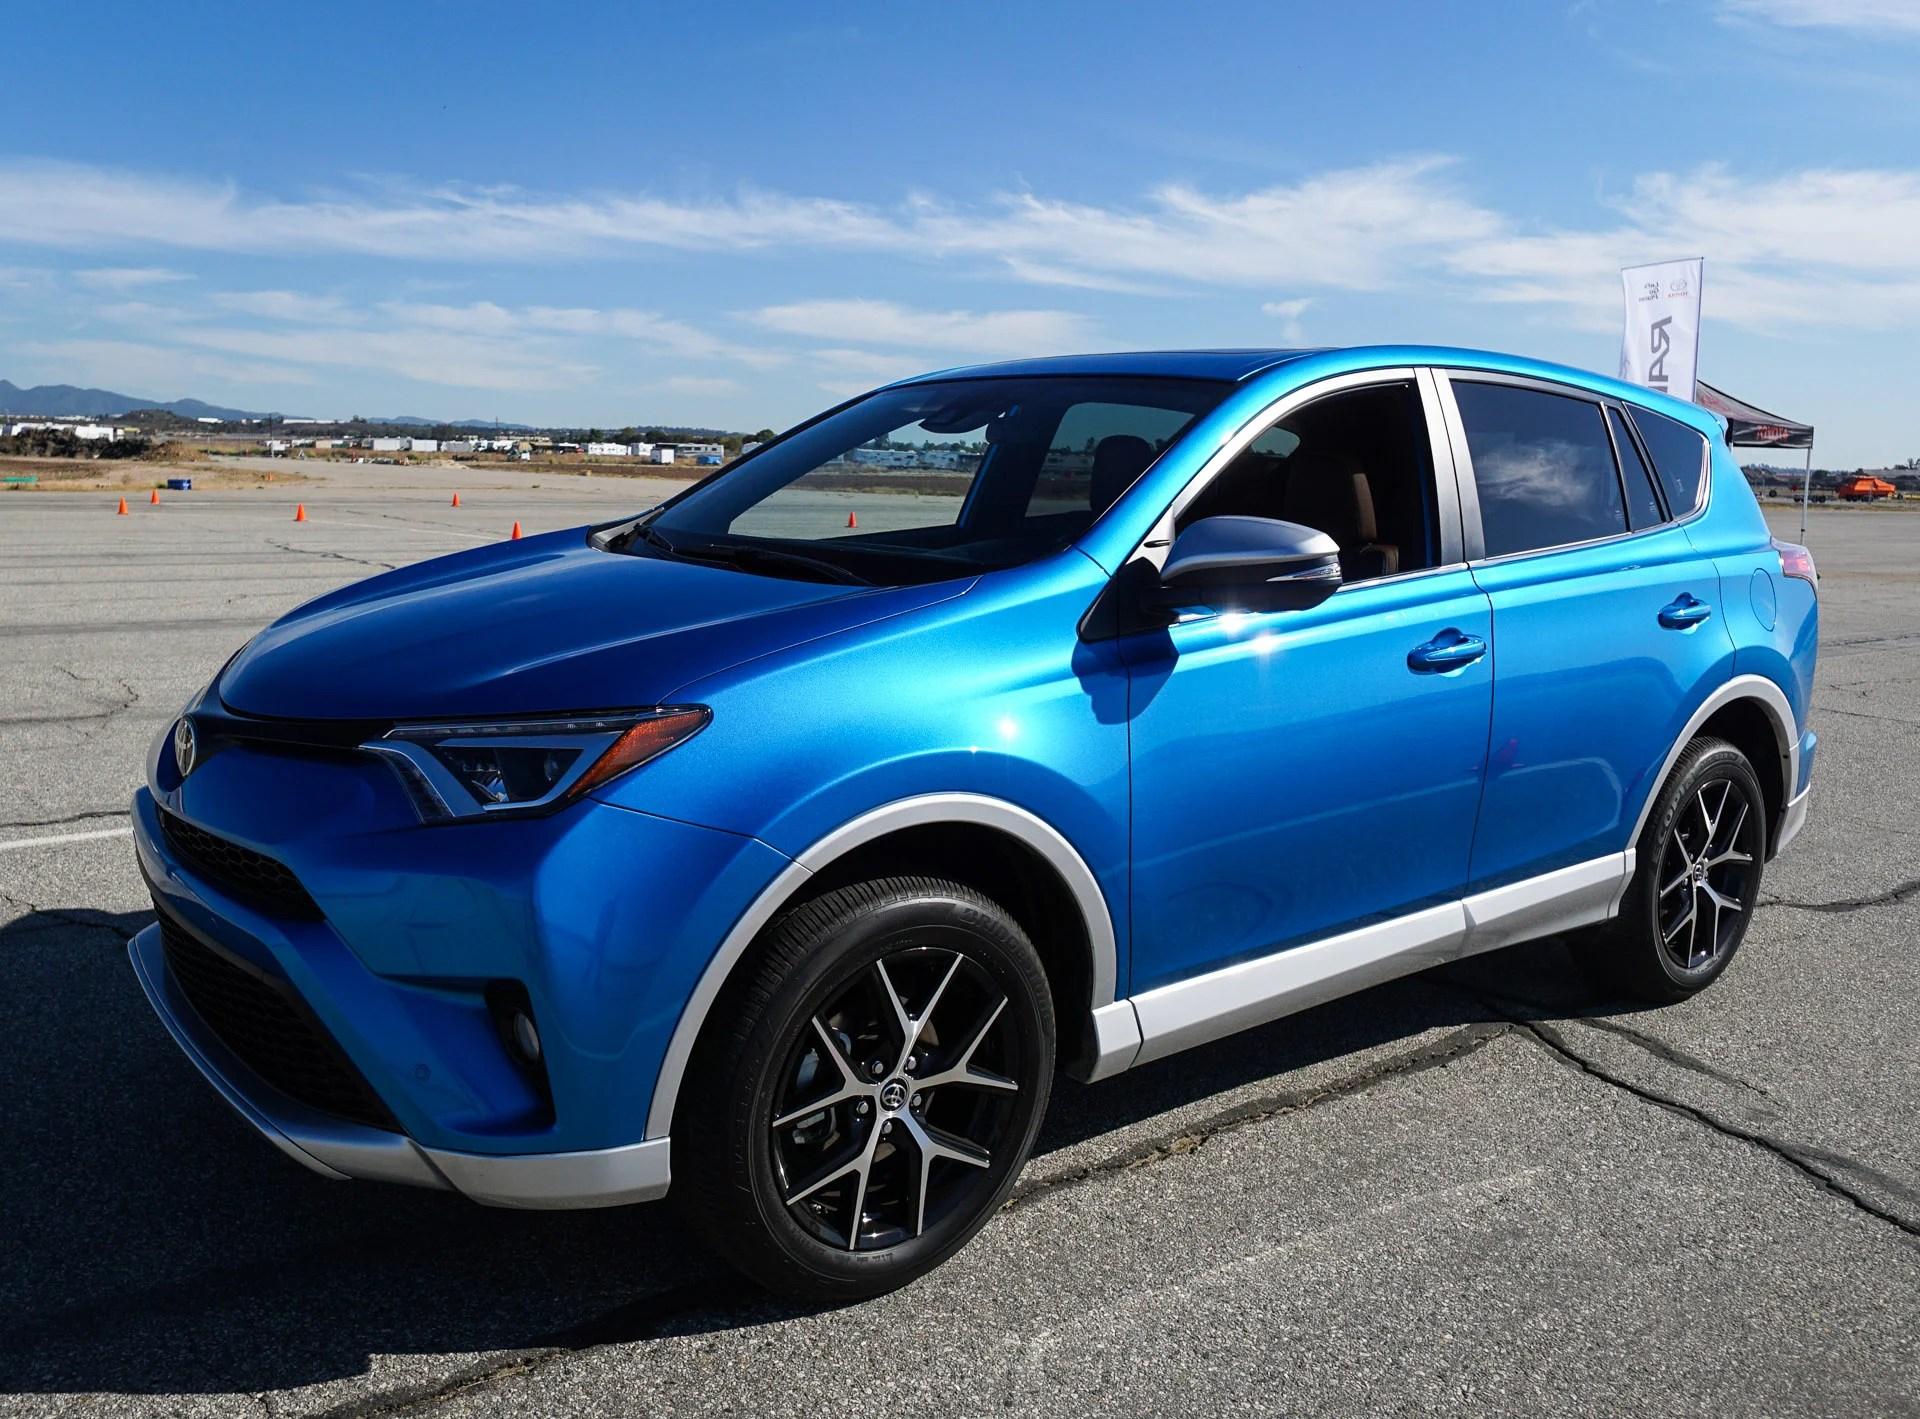 First Drive Review: 2016 Toyota RAV4 Hybrid and RAV4 SE